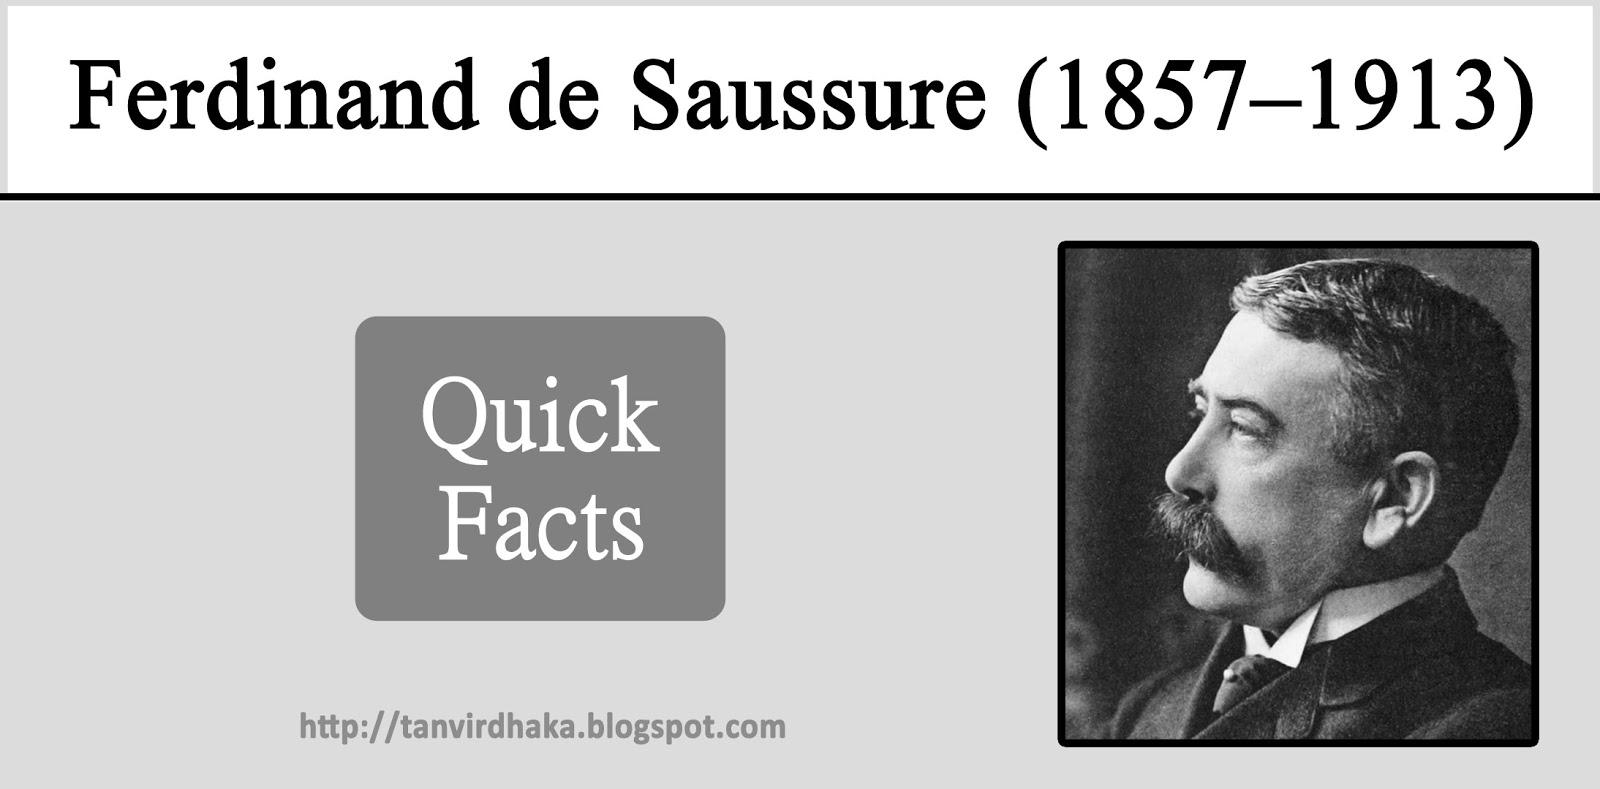 Ferdinand de Saussure, Swiss linguist: biography, works on linguistics 6